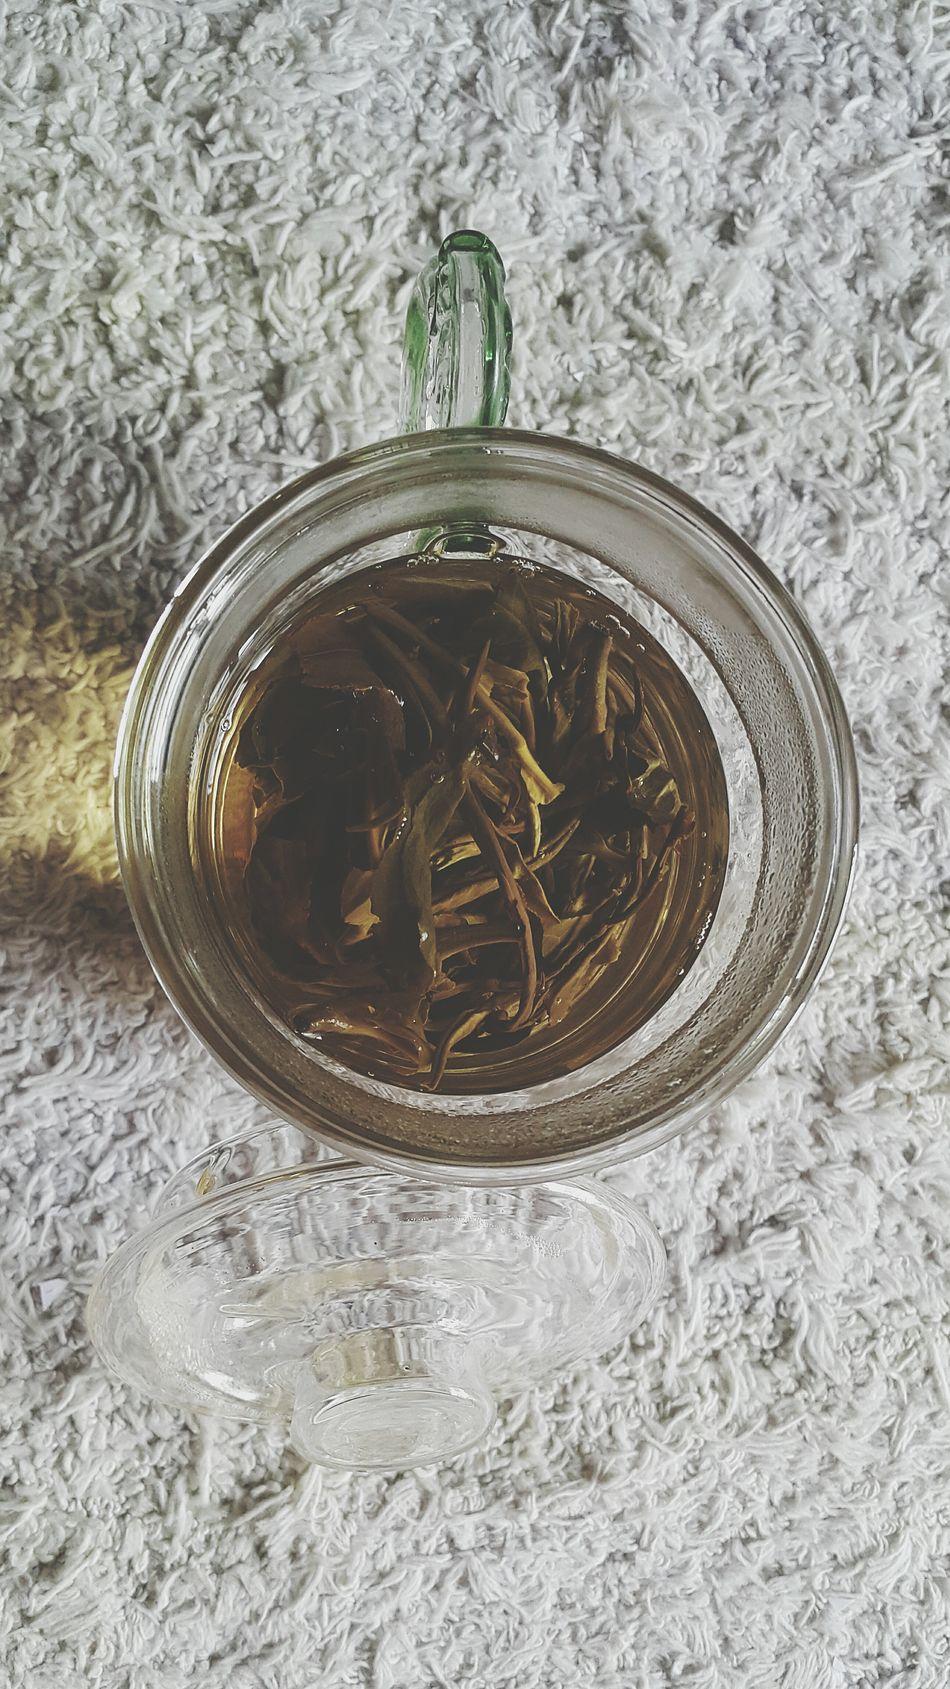 Jasmine Tea Green Tea Cup Of Tea TeaCup Glass Cup Fresh Tea Still Life Soft Light Beverage Liquid Lunch Refreshing Drink Chinese Tea